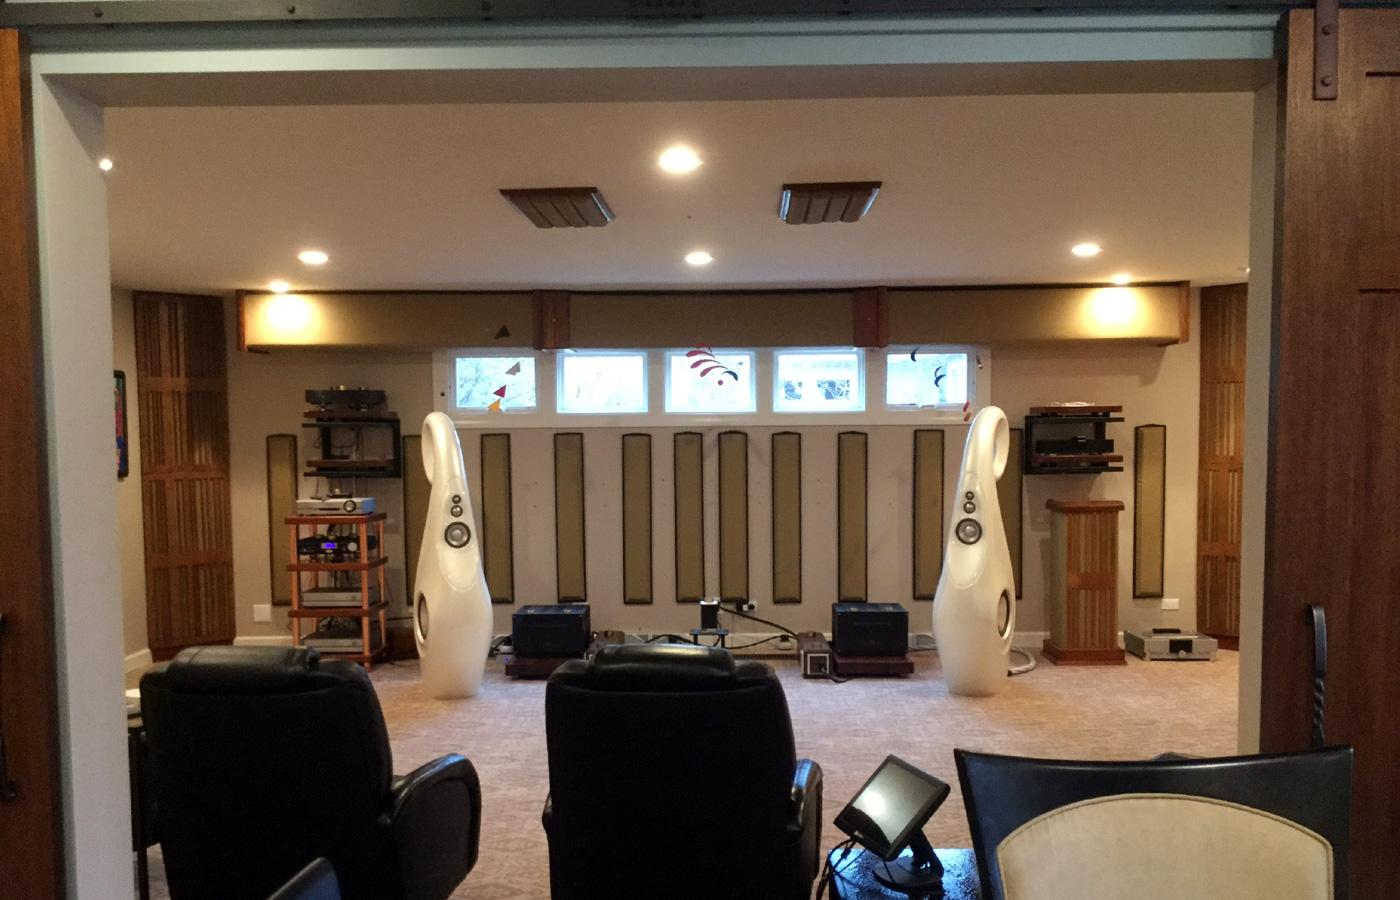 Rebuilding My Music Room, Part 2